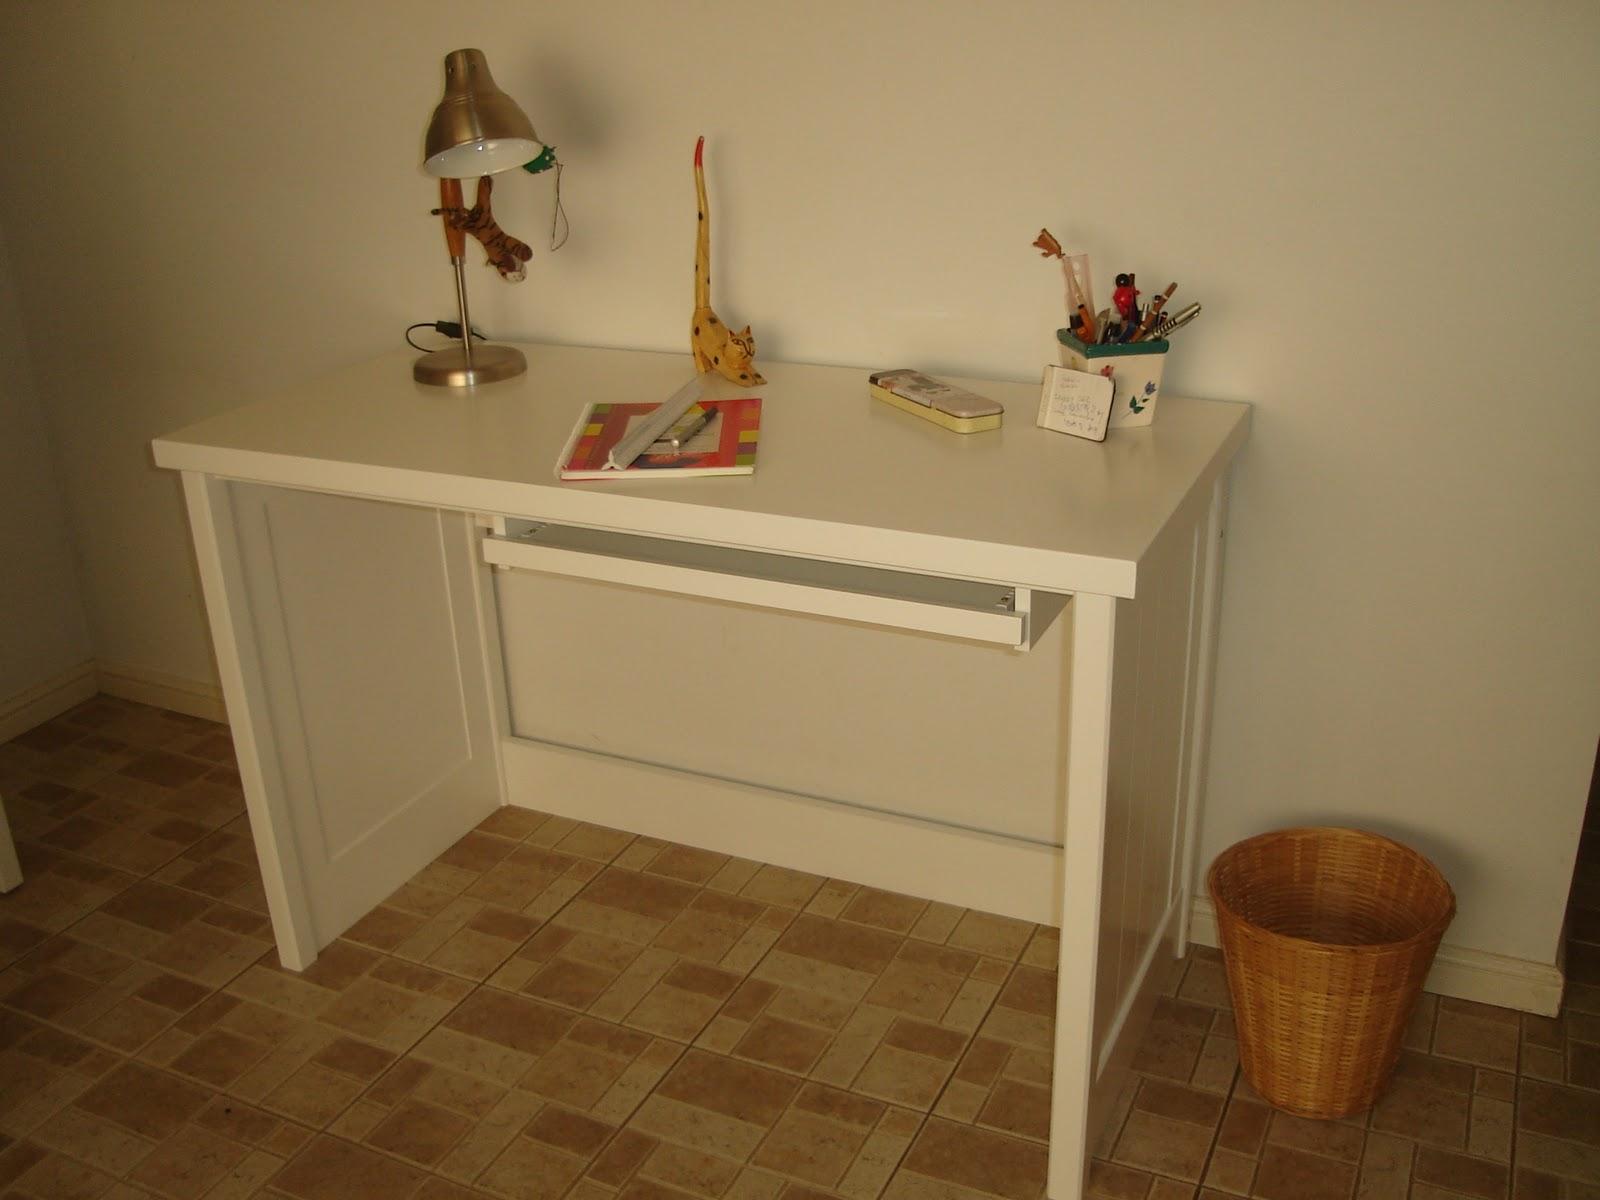 Morita bv muebles laqueados for Divan frances